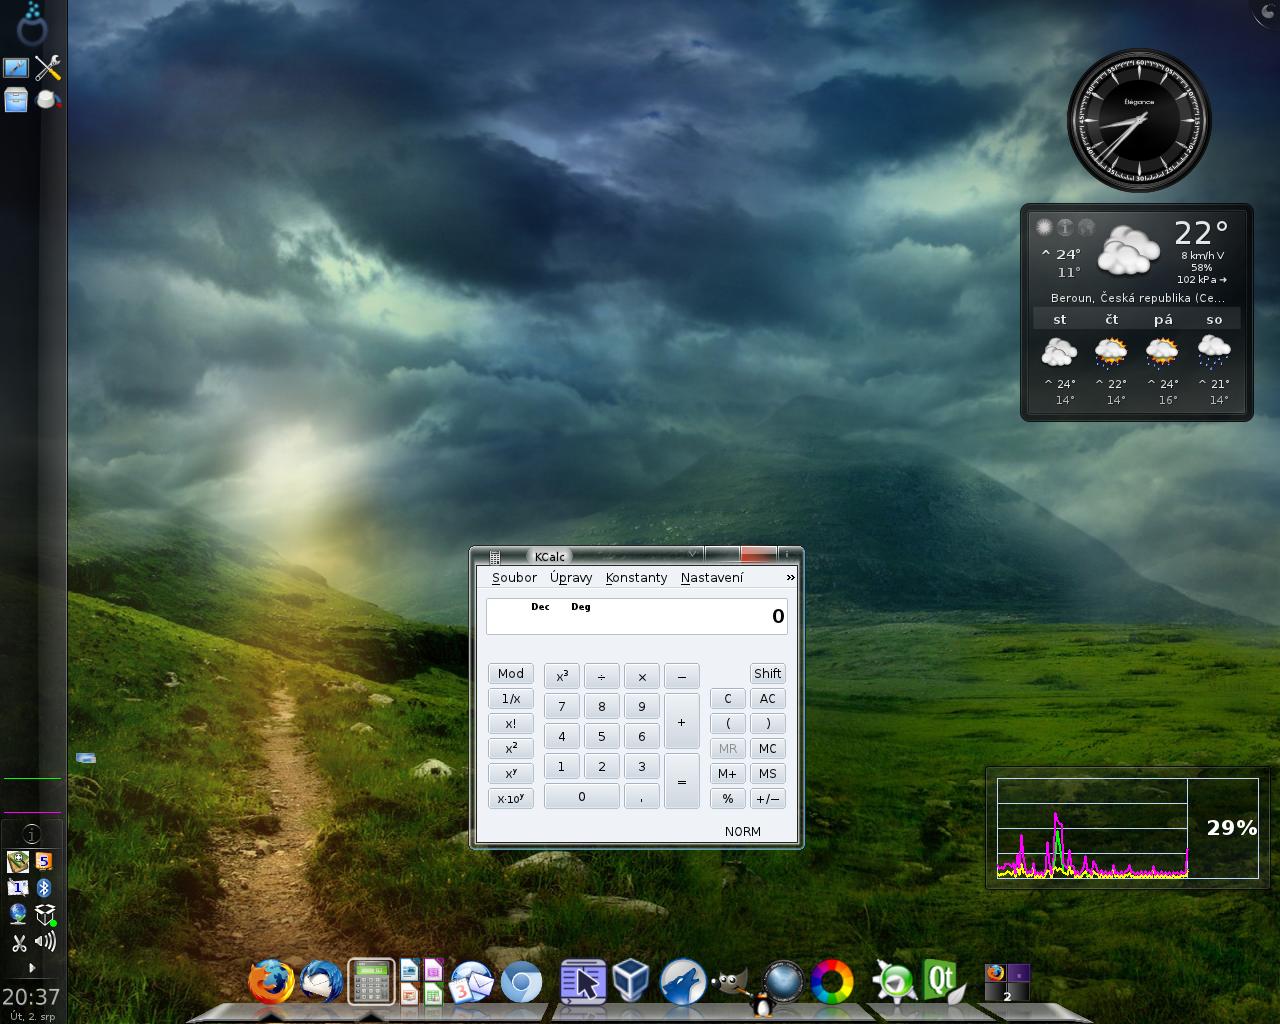 Vítek: Mageia 1, KDE4 - Compiz, emerald a cairo